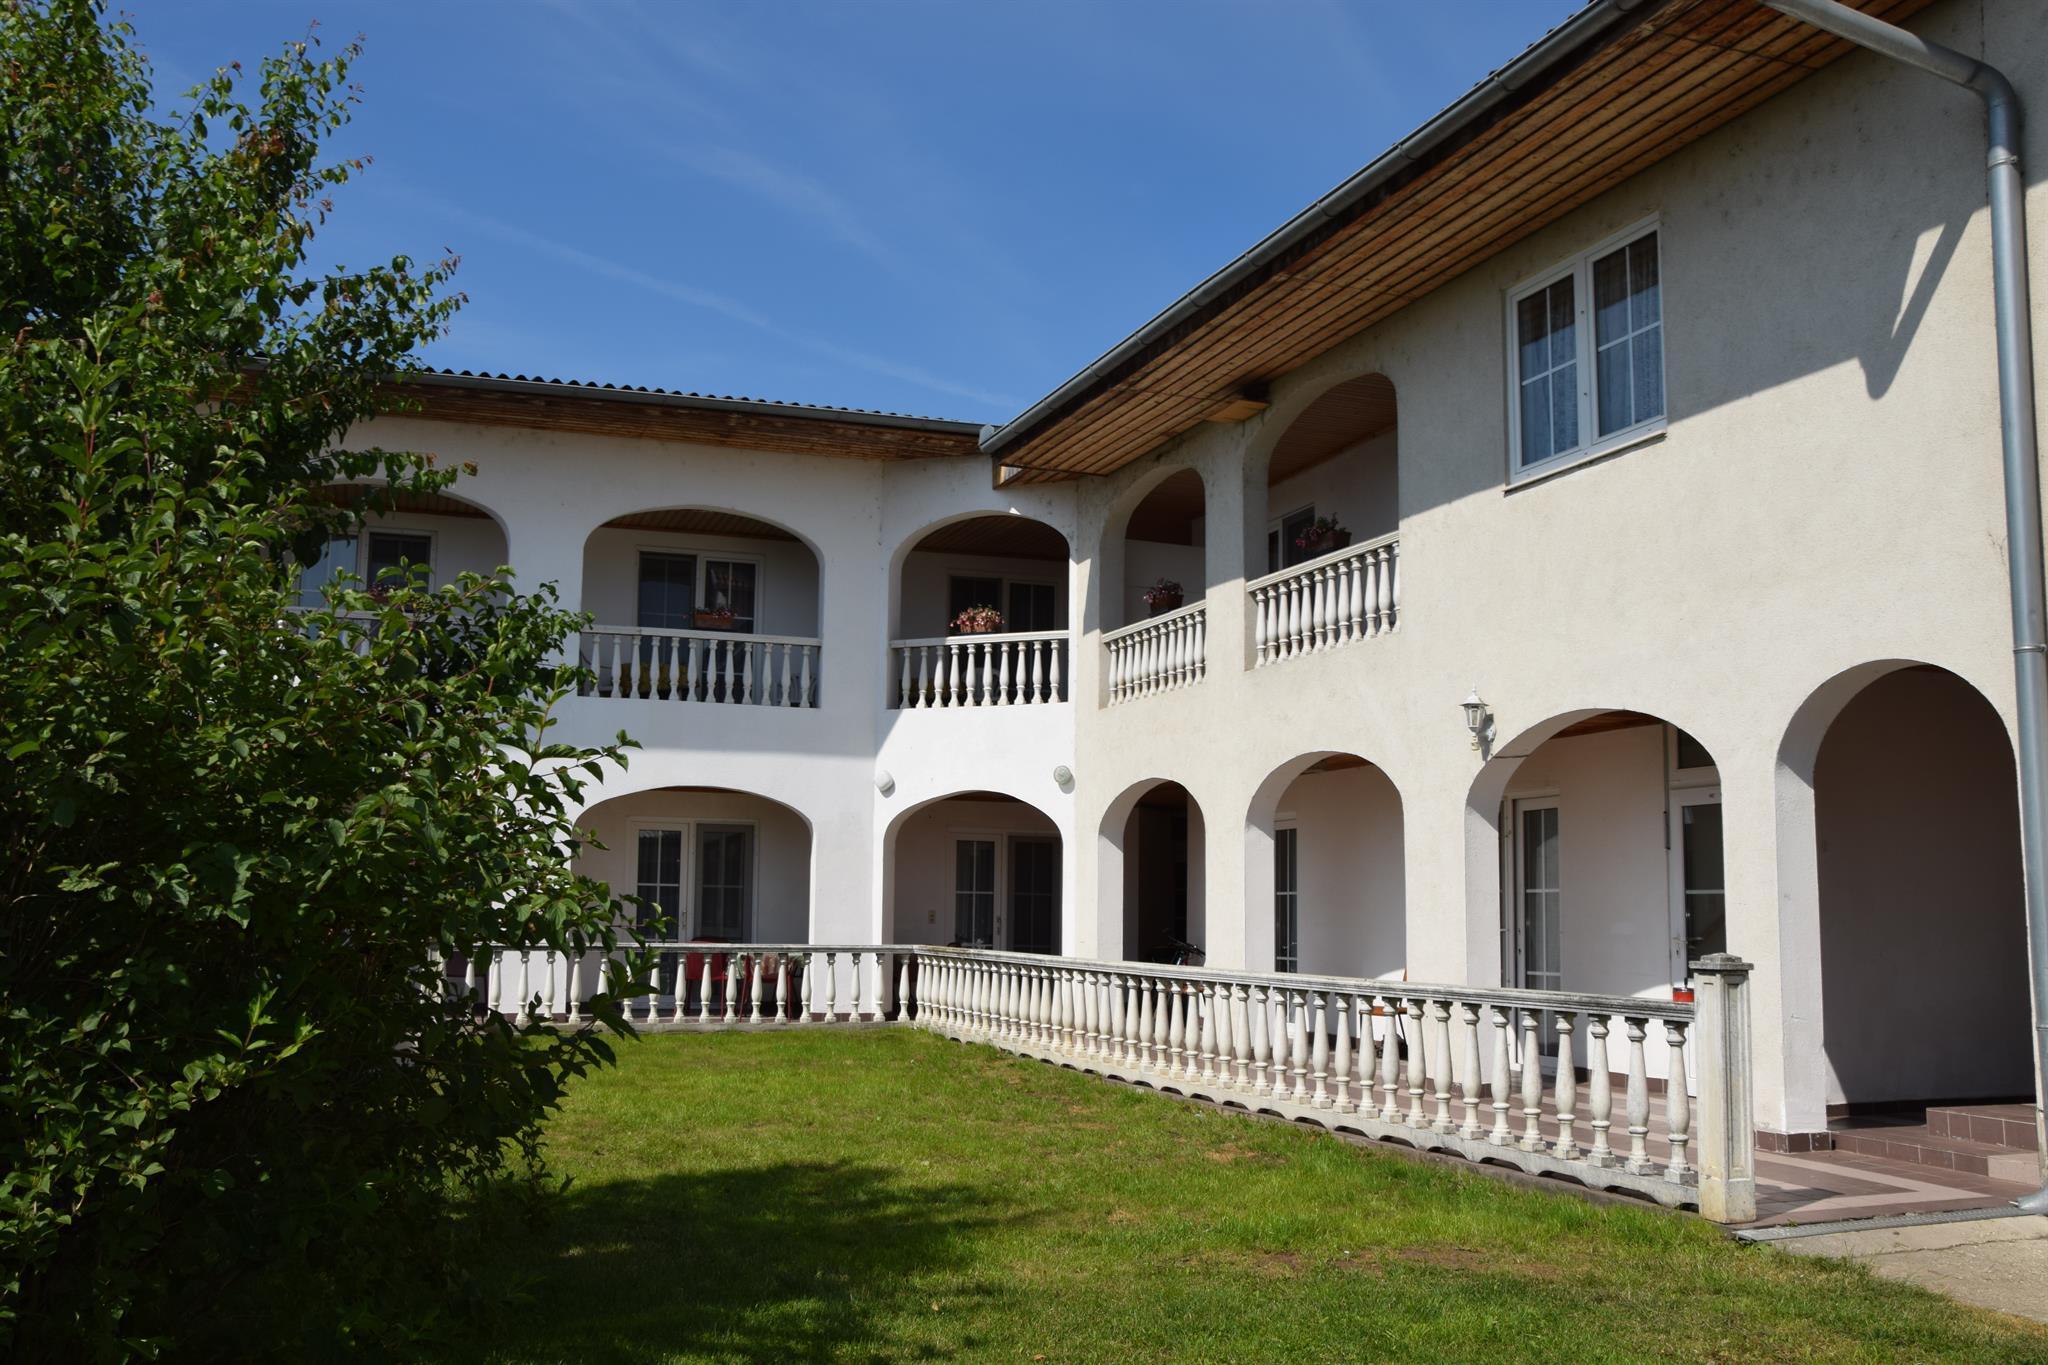 Holiday apartment Rosenhof Appartementhaus Appartement 37m² (2008886), Podersdorf am See, Lake Neusiedl, Burgenland, Austria, picture 5